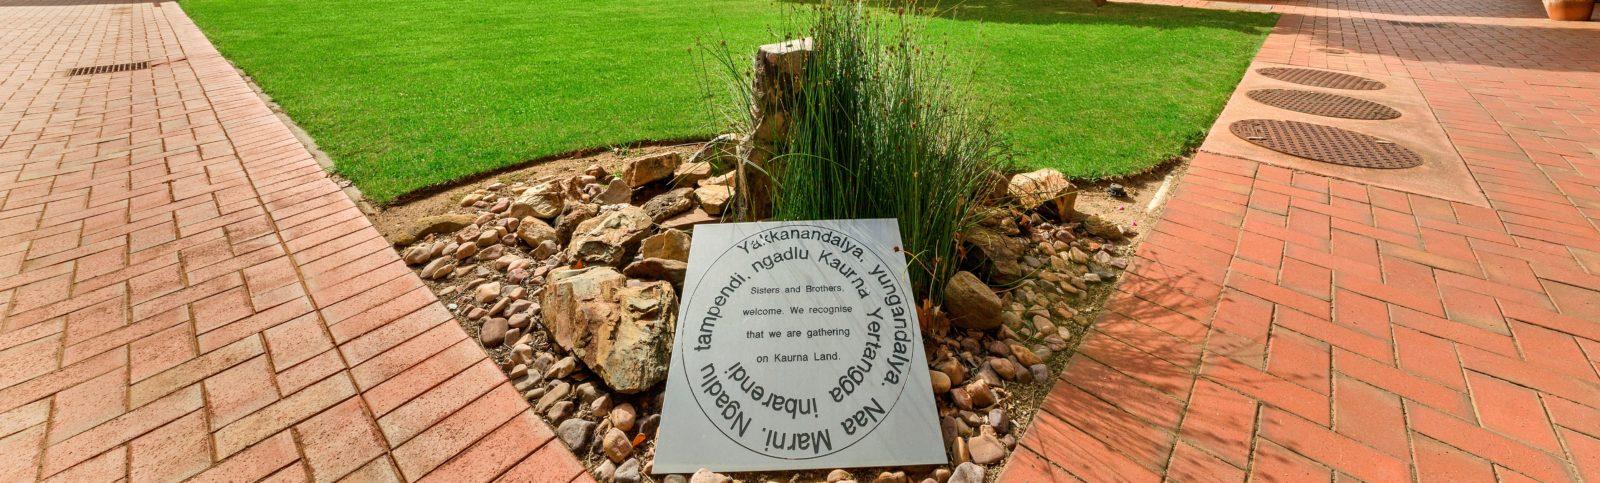 Bethany Garden